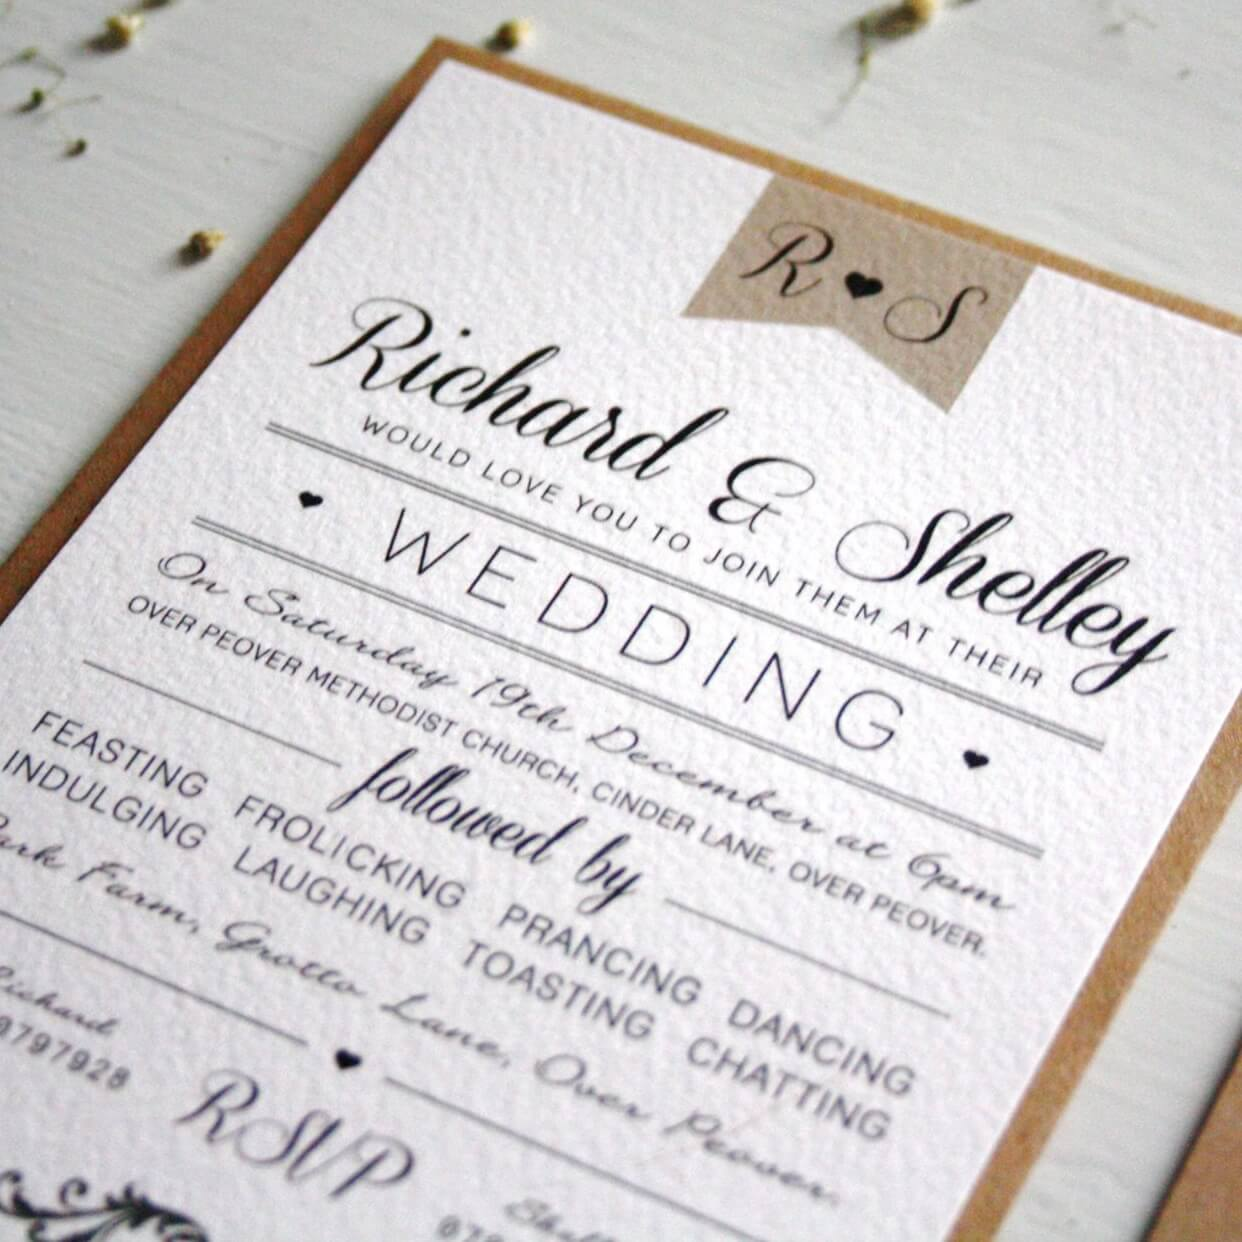 Elegant Type Vintage Wedding Invitation - designed by Rodo Creative in Manchester